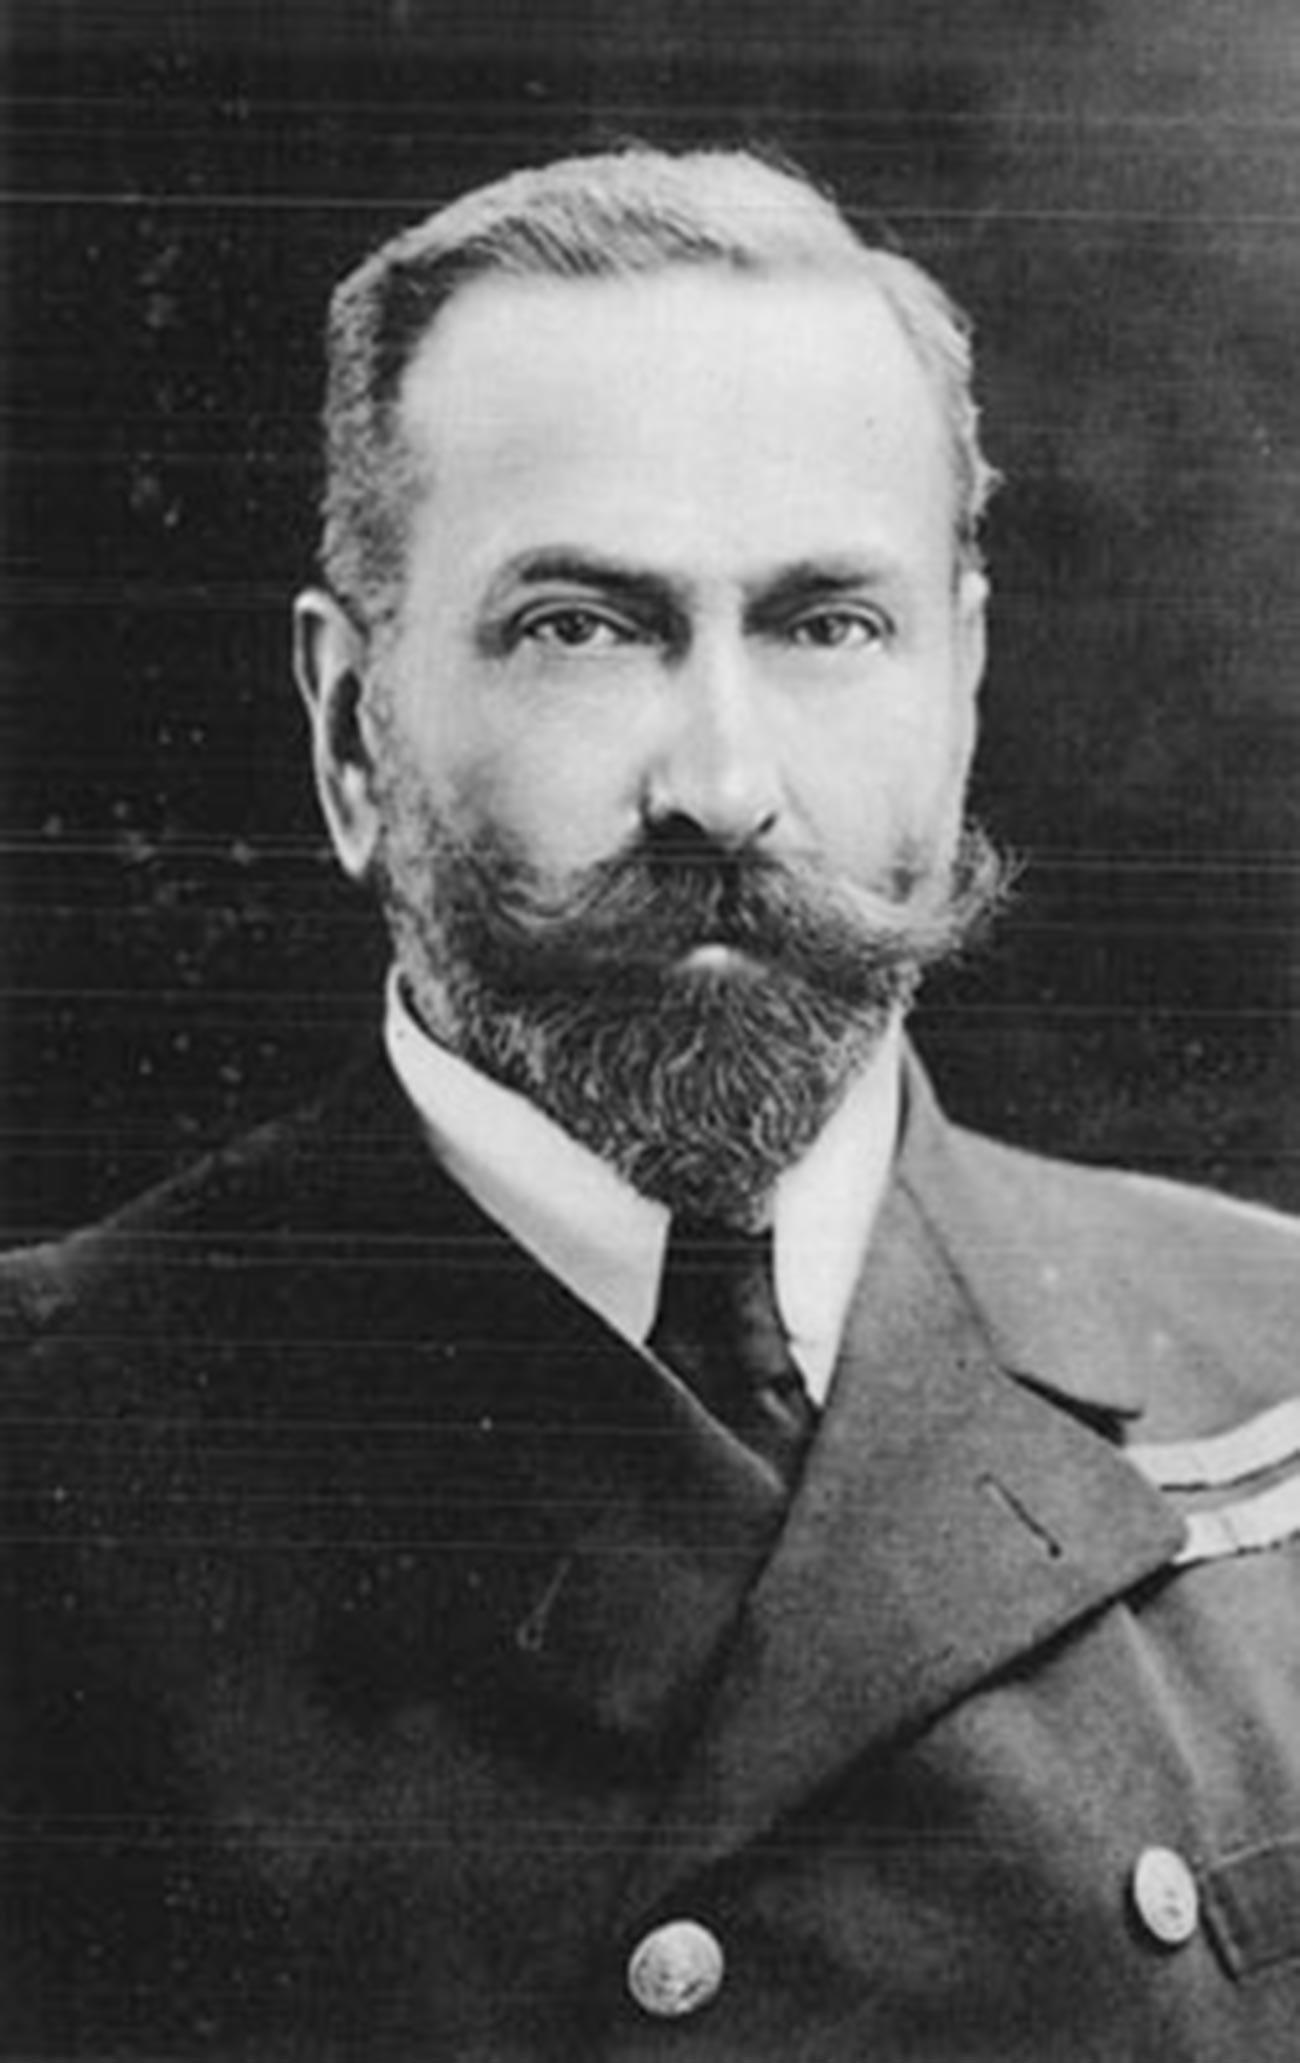 Принц Луи Александър от Батенберг (Louis Alexander Mountbatten), 1854-1921. Британски адмирал.